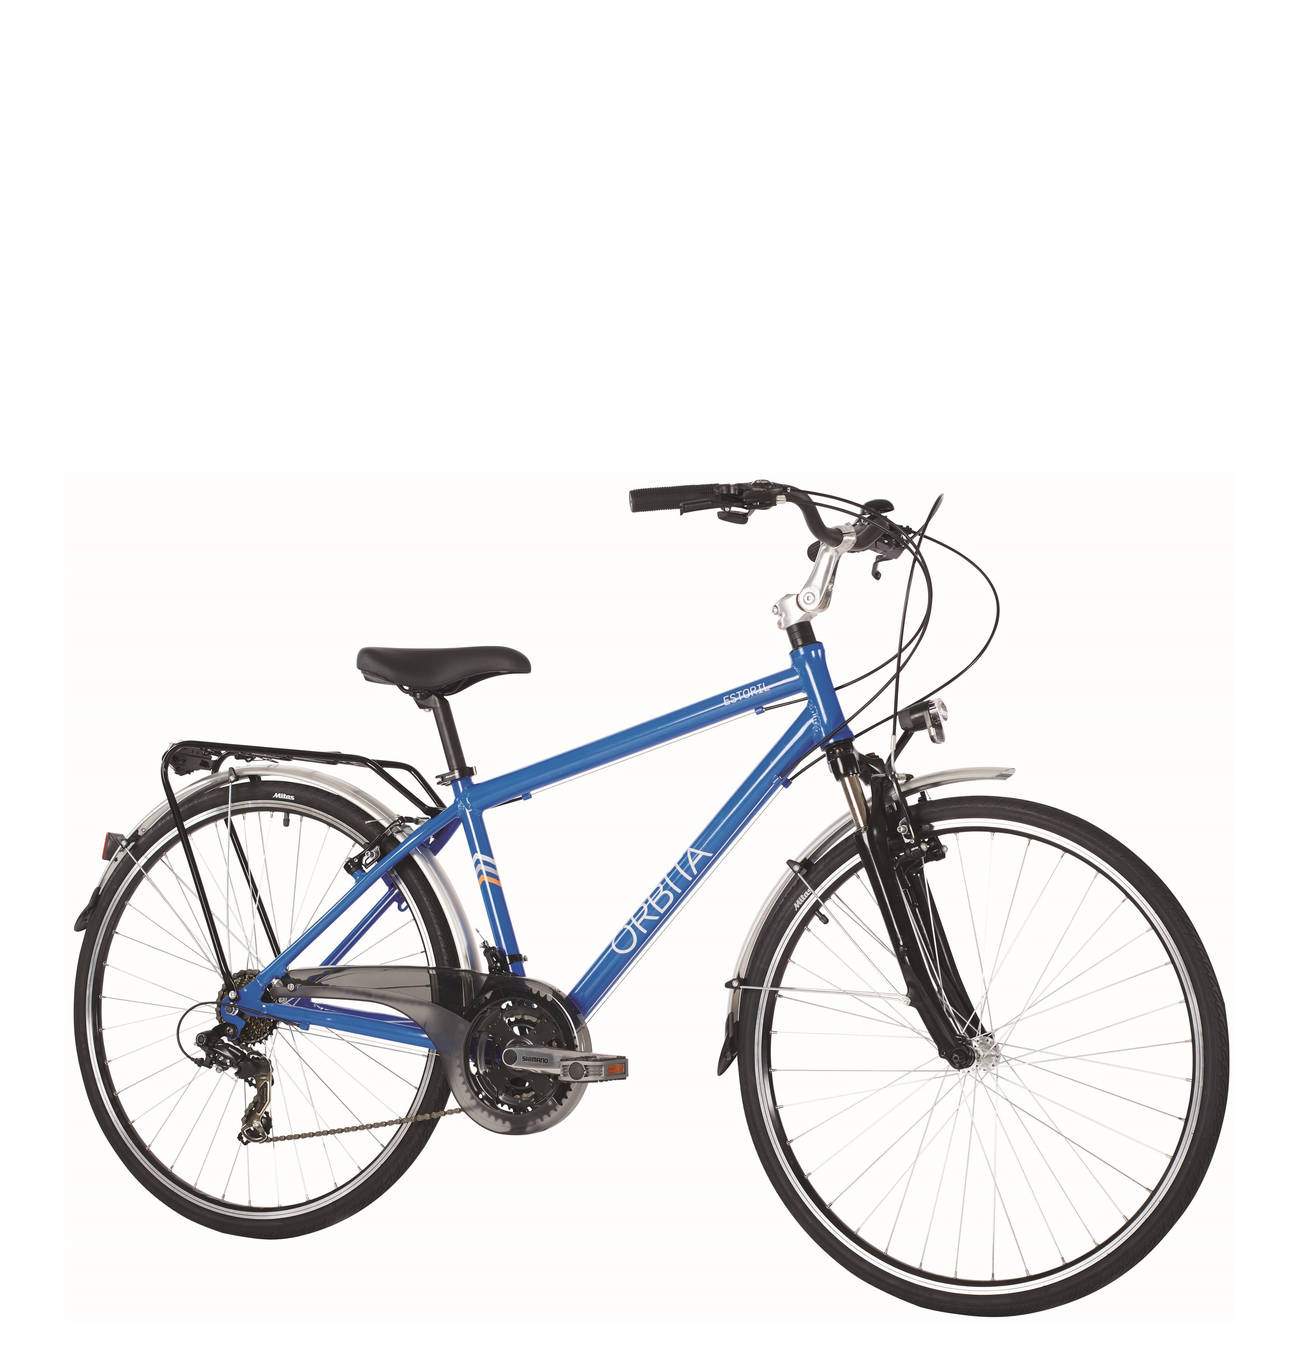 28 Zoll Herren Trekking Fahrrad 21 Gang Estoril Plus ...